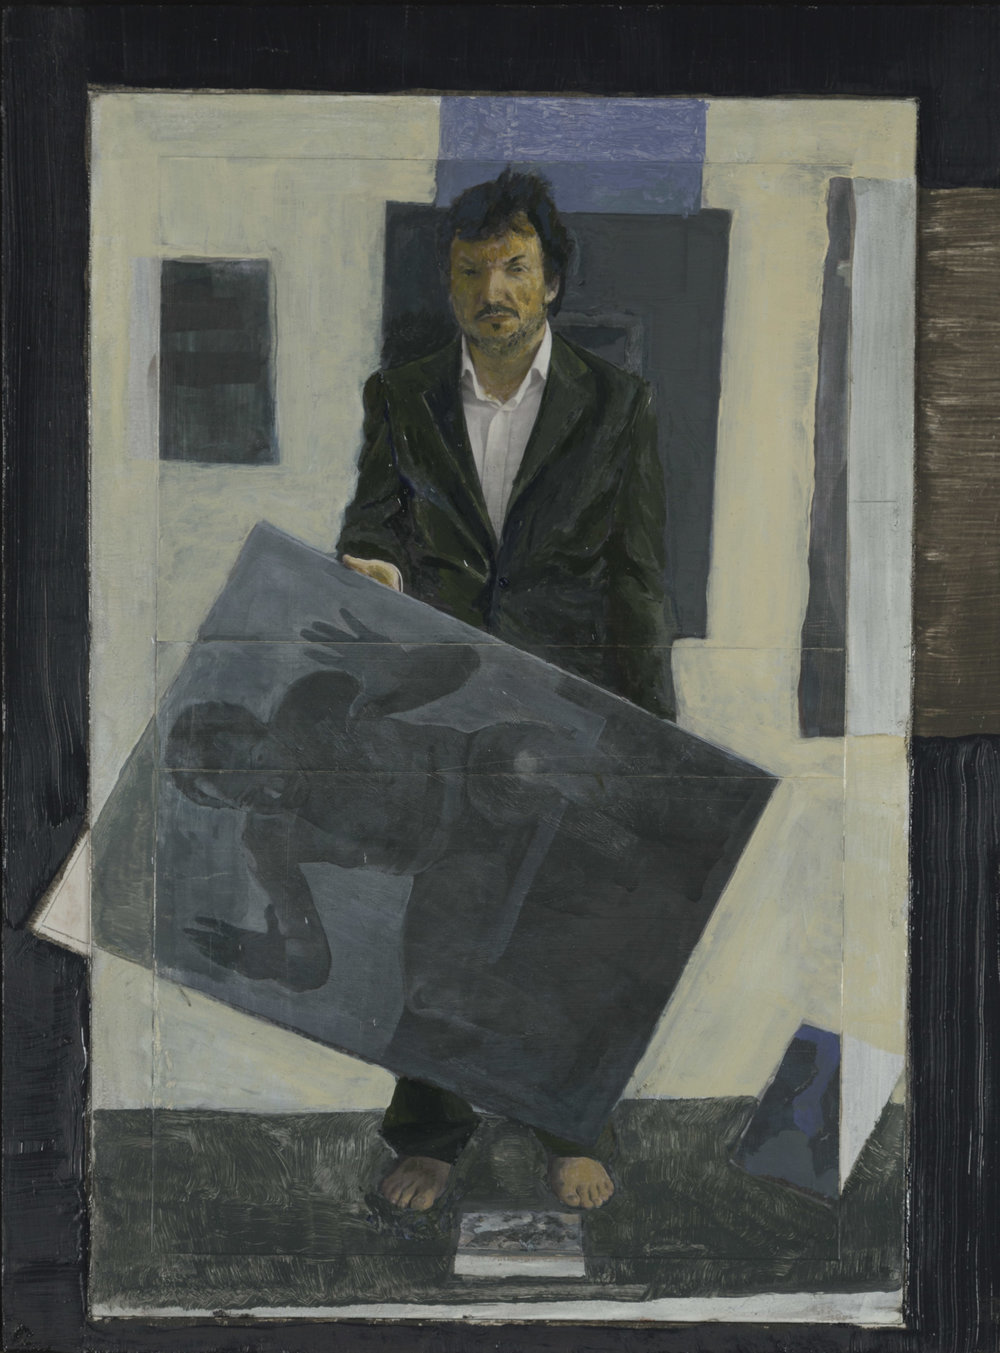 2019, 70 x 50 cm, oil on canvas